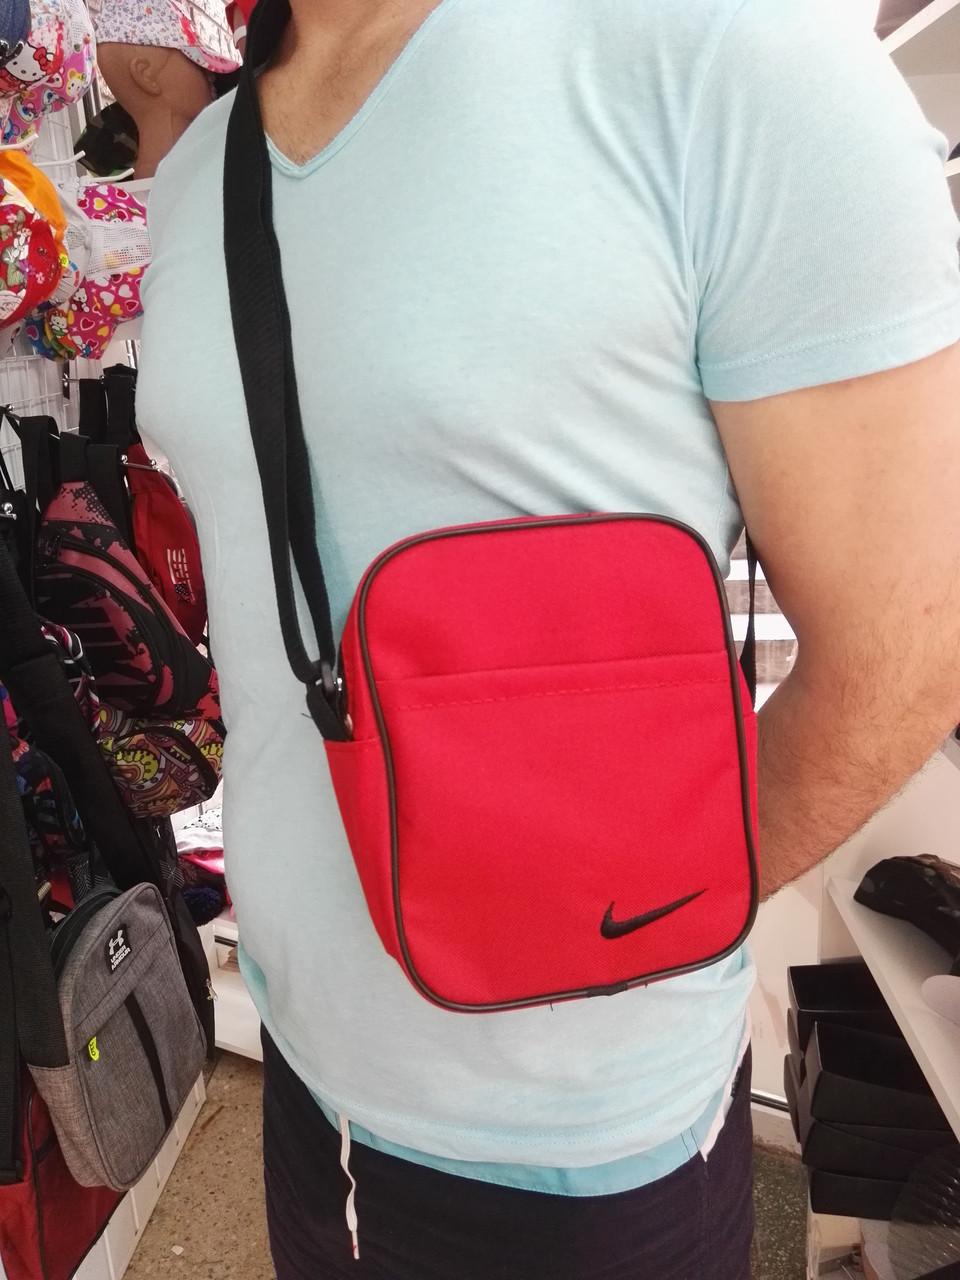 5c8ed0e5c7ce Сумка Через Плечо/ Мессенджер, Nike Красный, 21х16 — в Категории